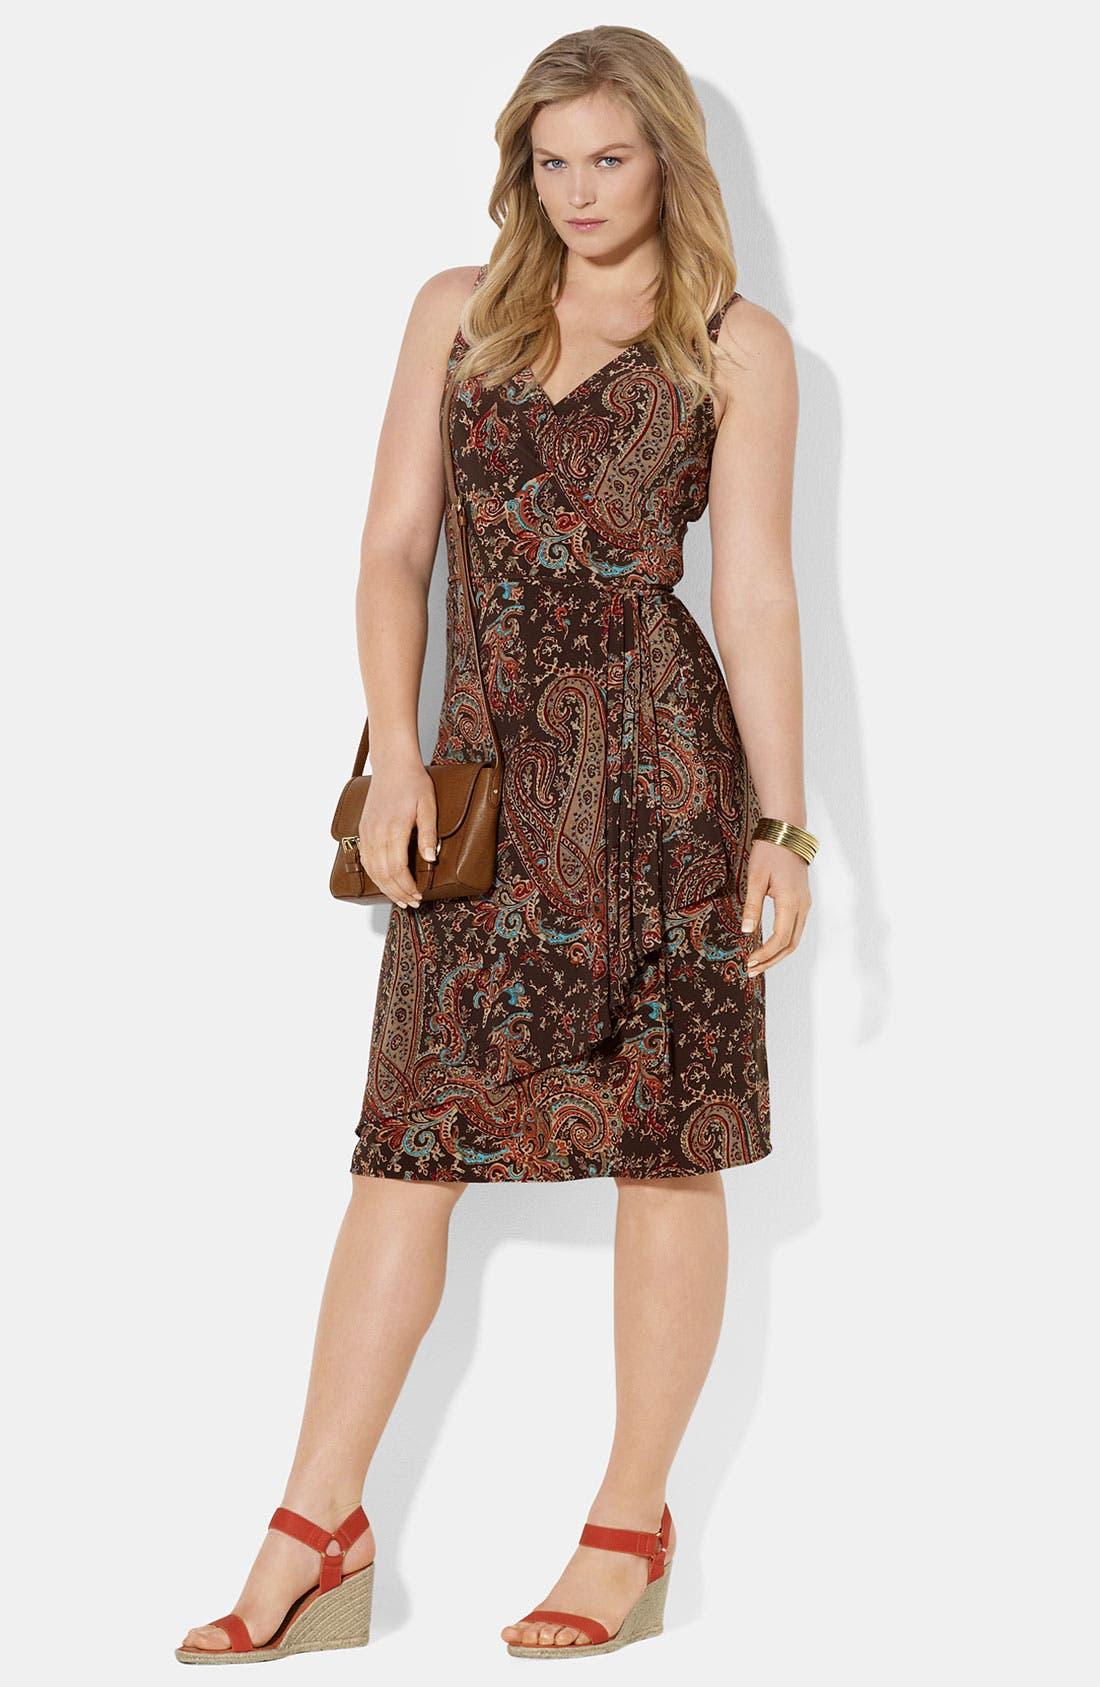 Alternate Image 1 Selected - Lauren Ralph Lauren Sleeveless Faux Wrap Jersey Dress (Plus)